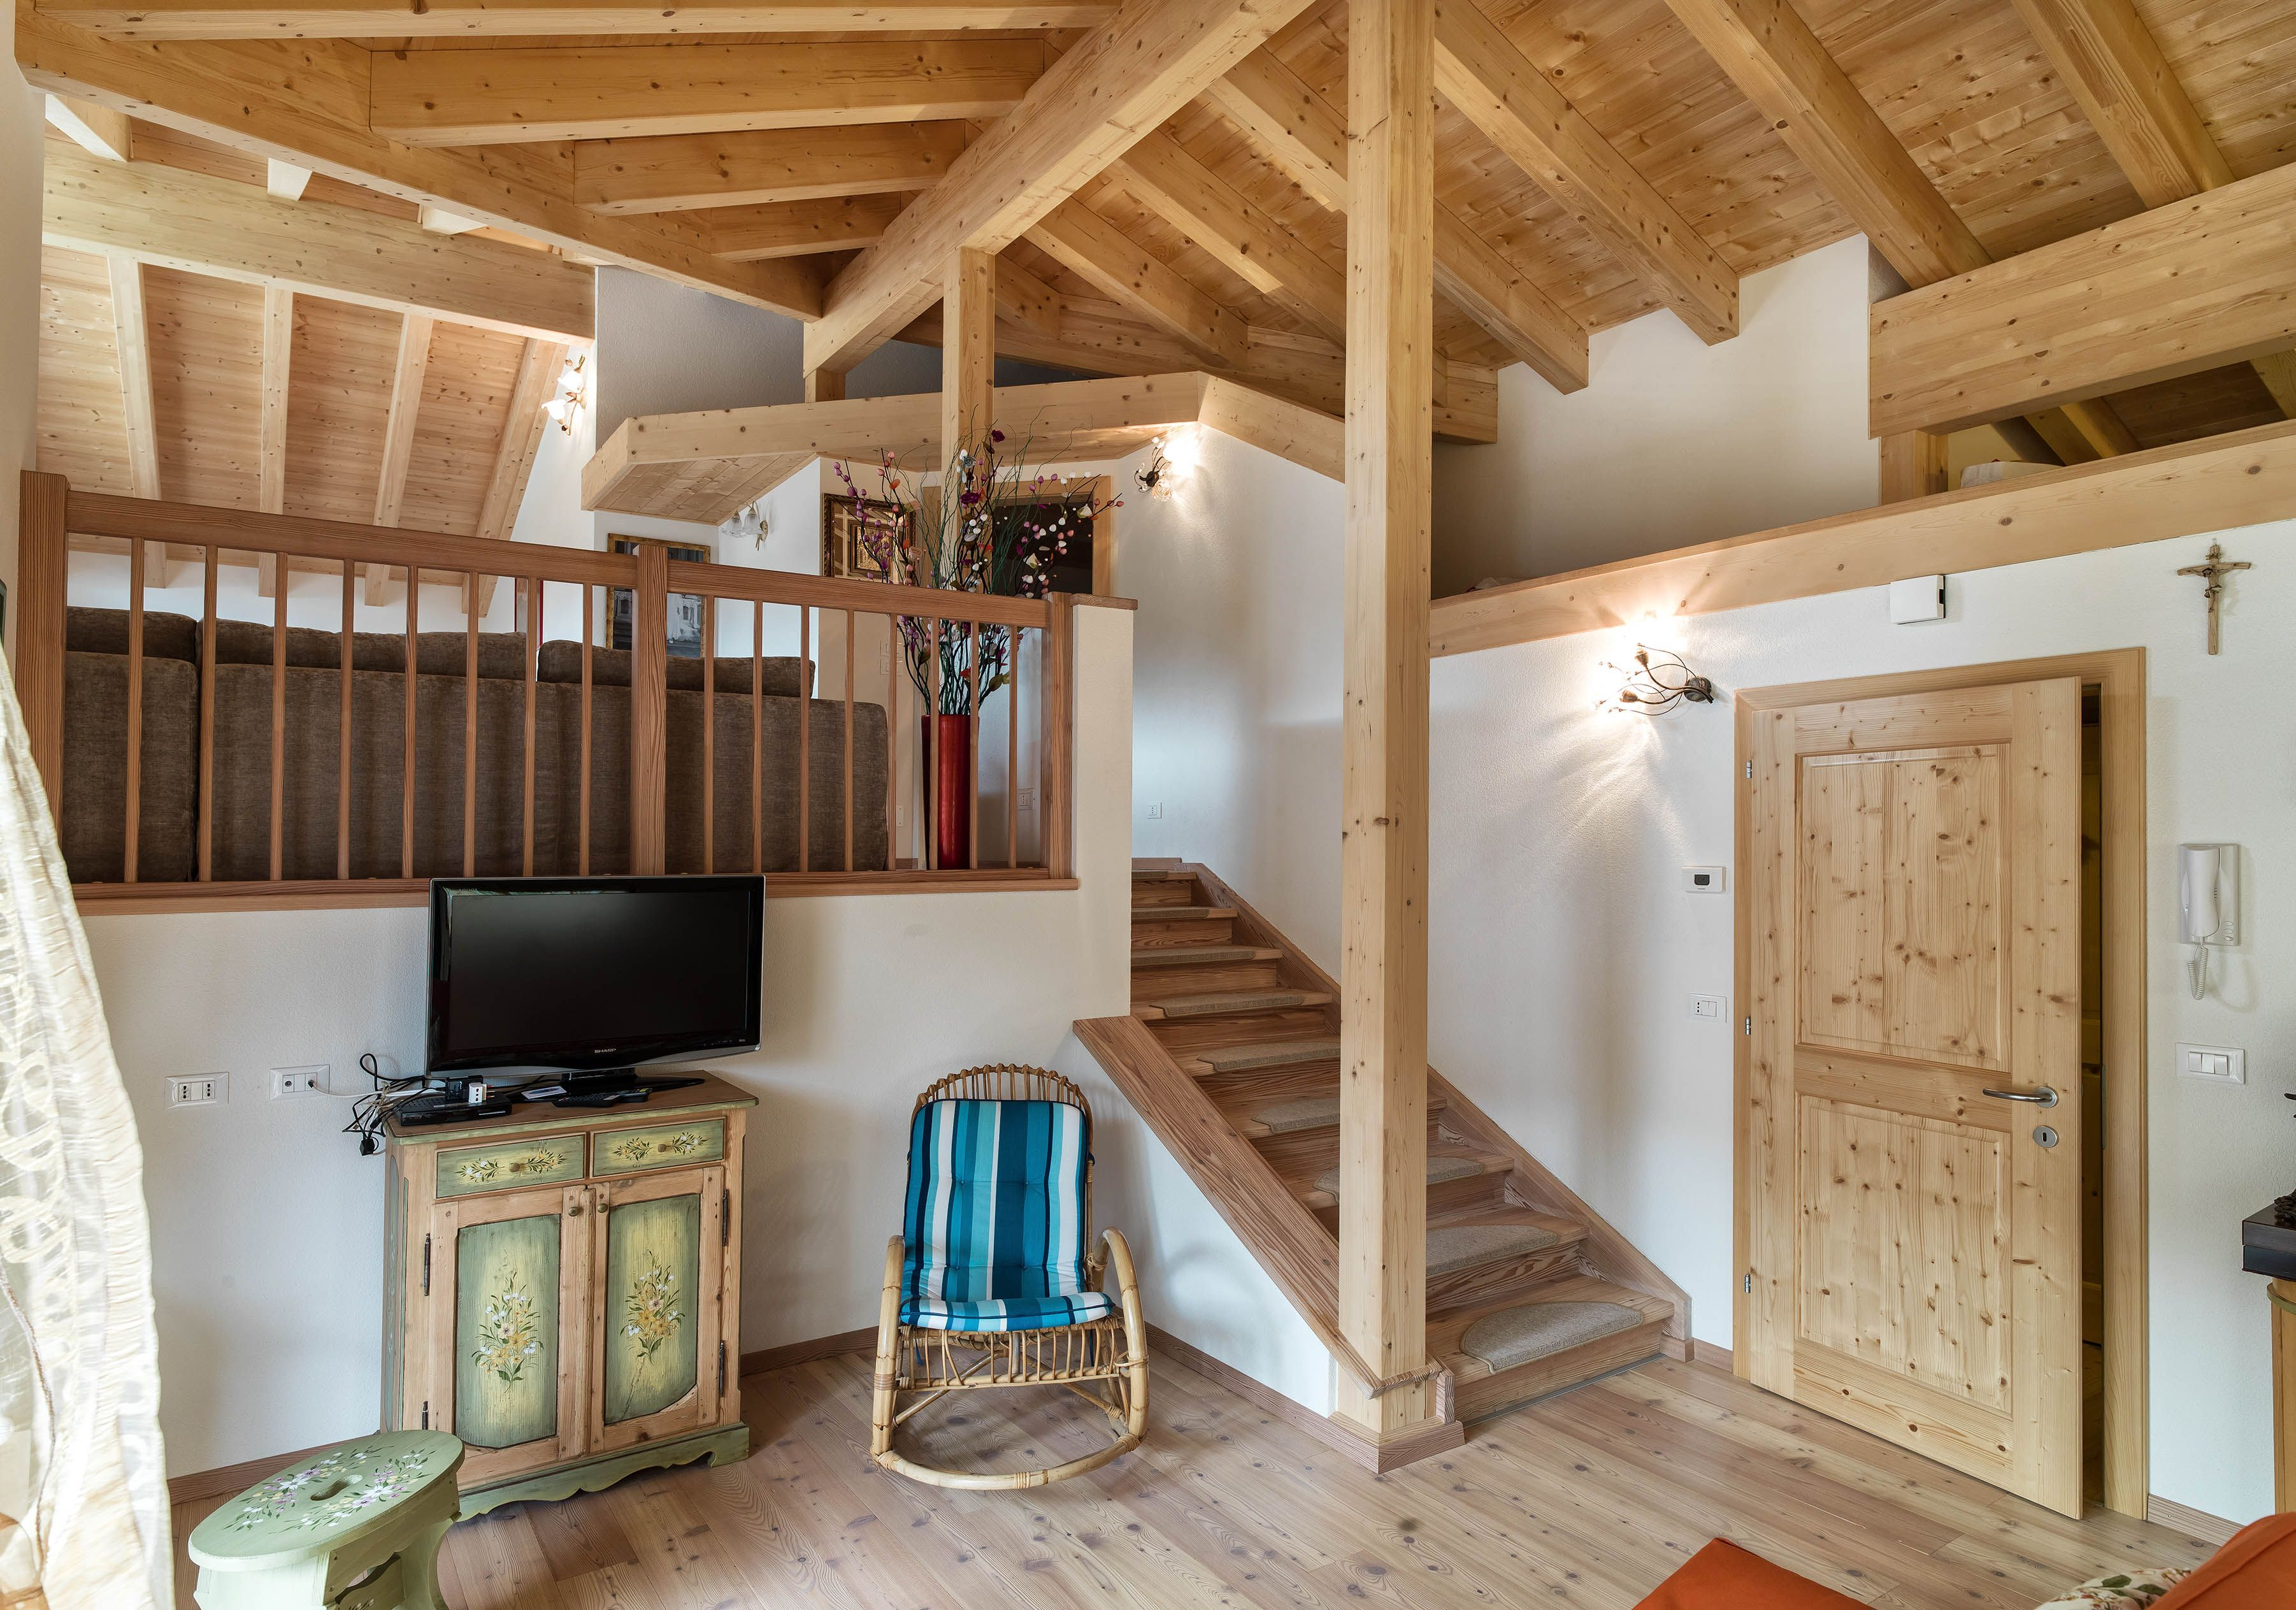 Design in legno Rubner Haus  Casa Rubner 102  Pinterest  Haus